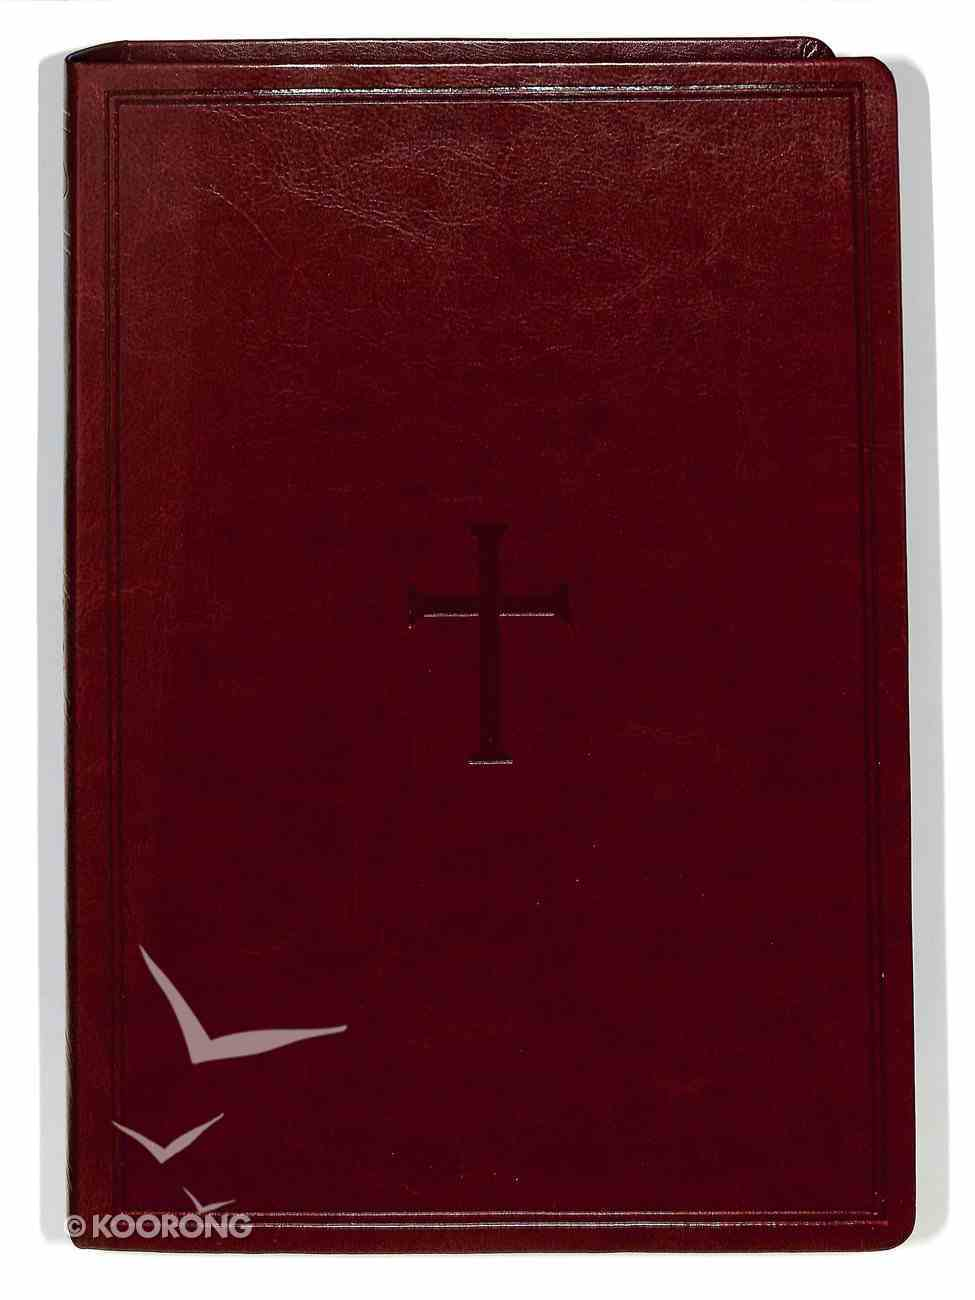 NKJV Super Giant Print Reference Bible Brown Premium Imitation Leather